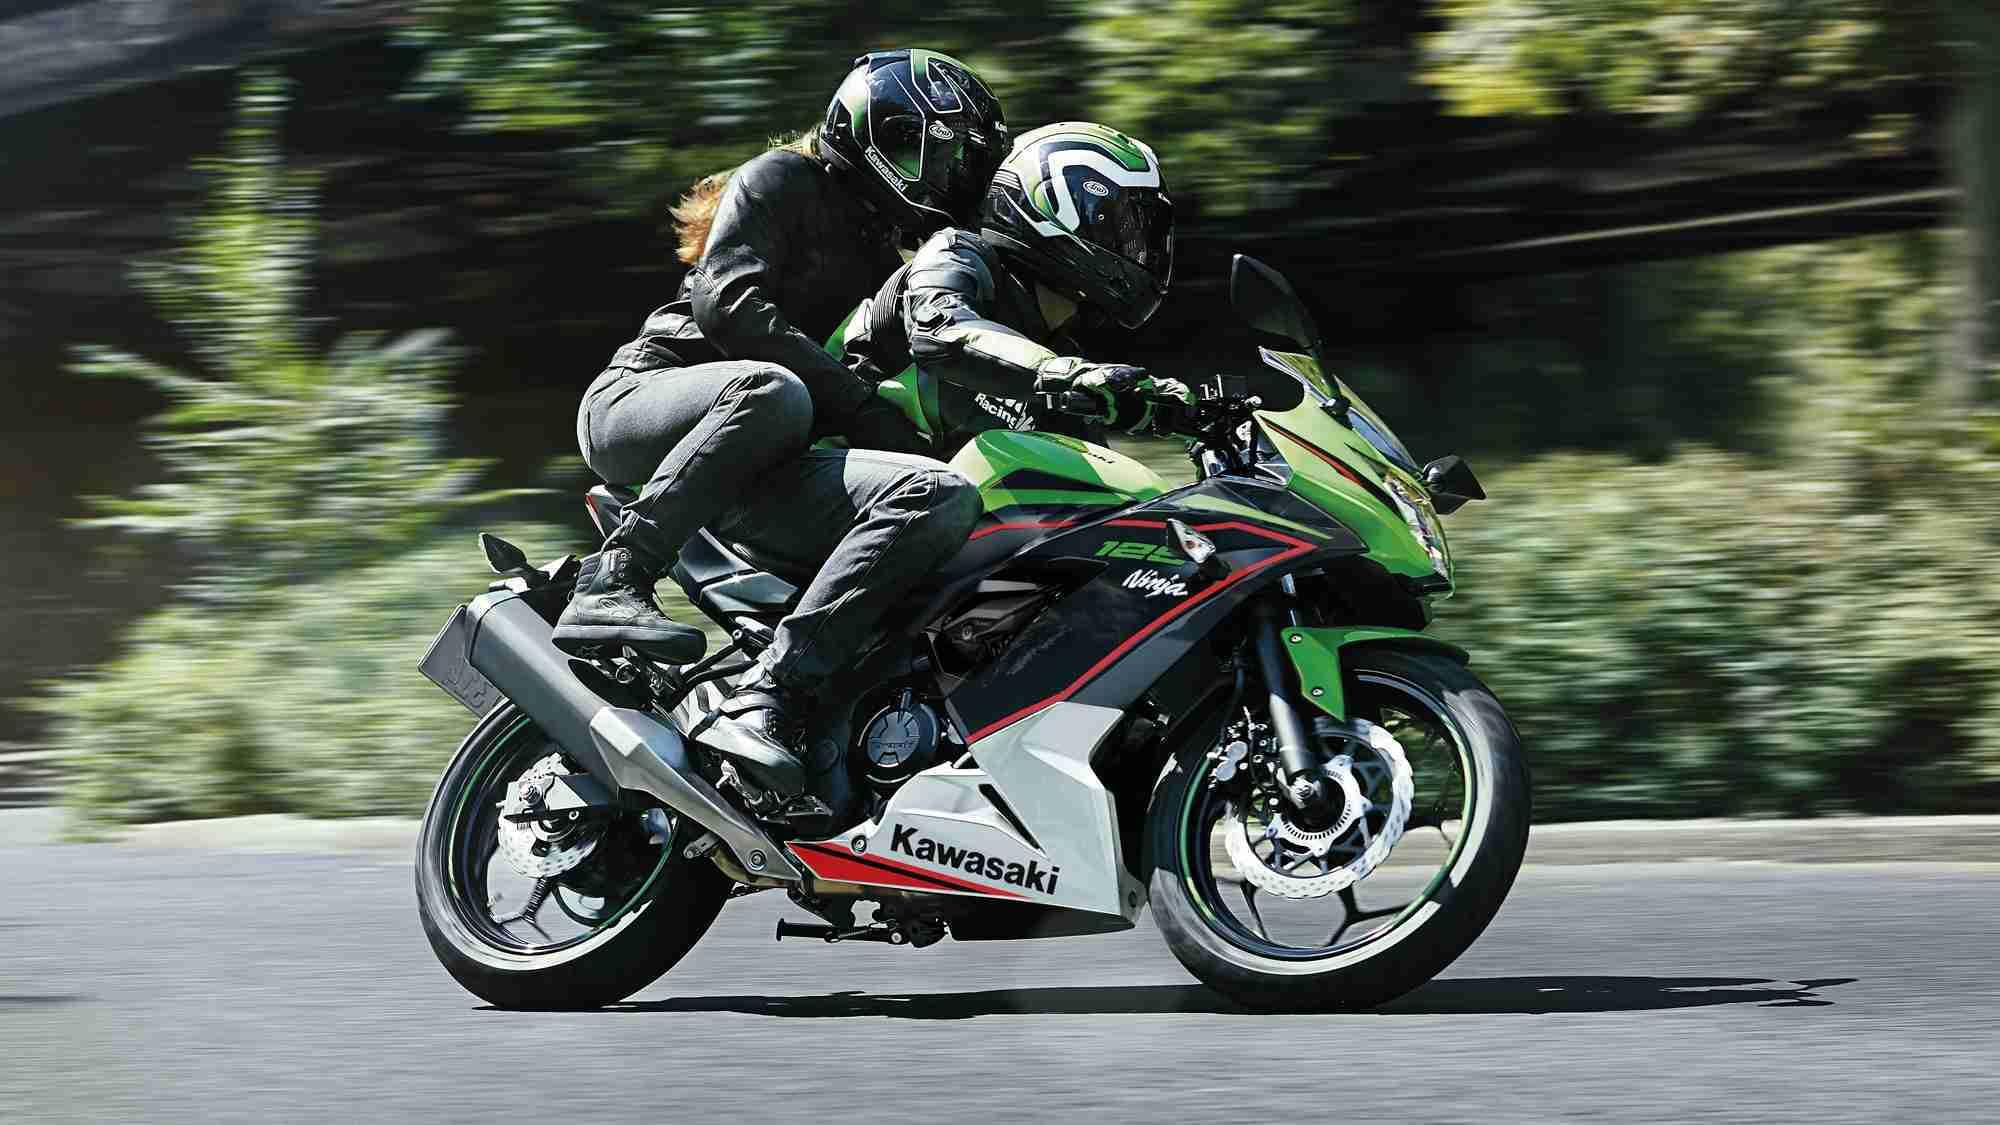 2021 Kawasaki Ninja 125